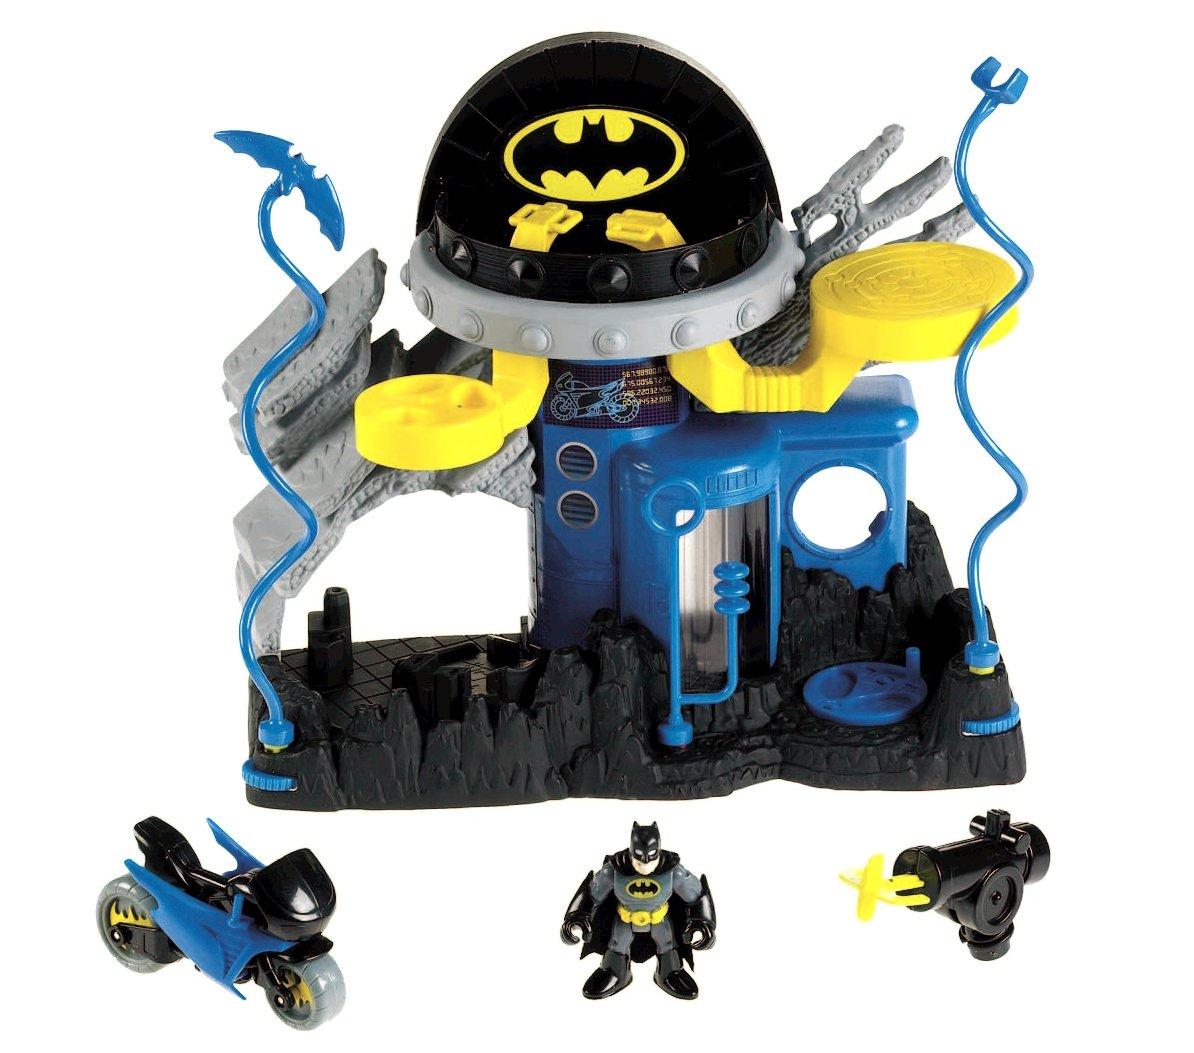 Fisher-Preis Imaginext Super Super Super Friends Bat Command Center 8bb9e0